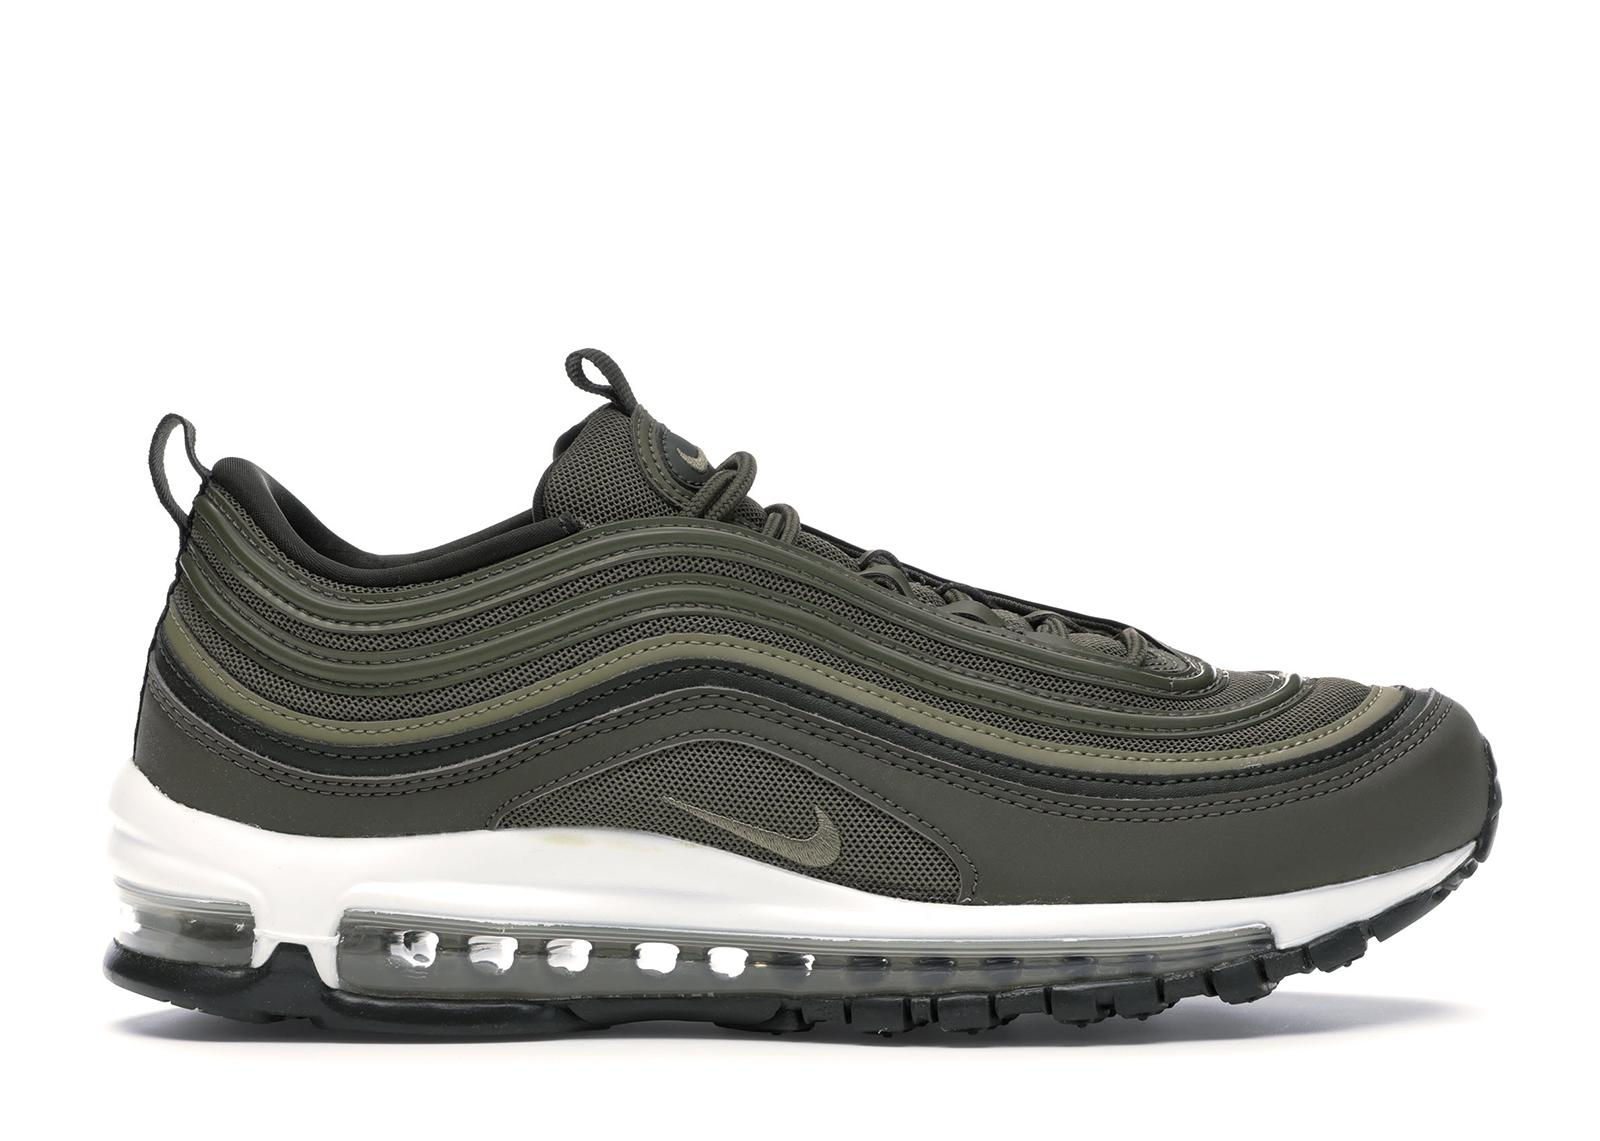 Nike Wmns Air Max 97 Lx Women's Shoes